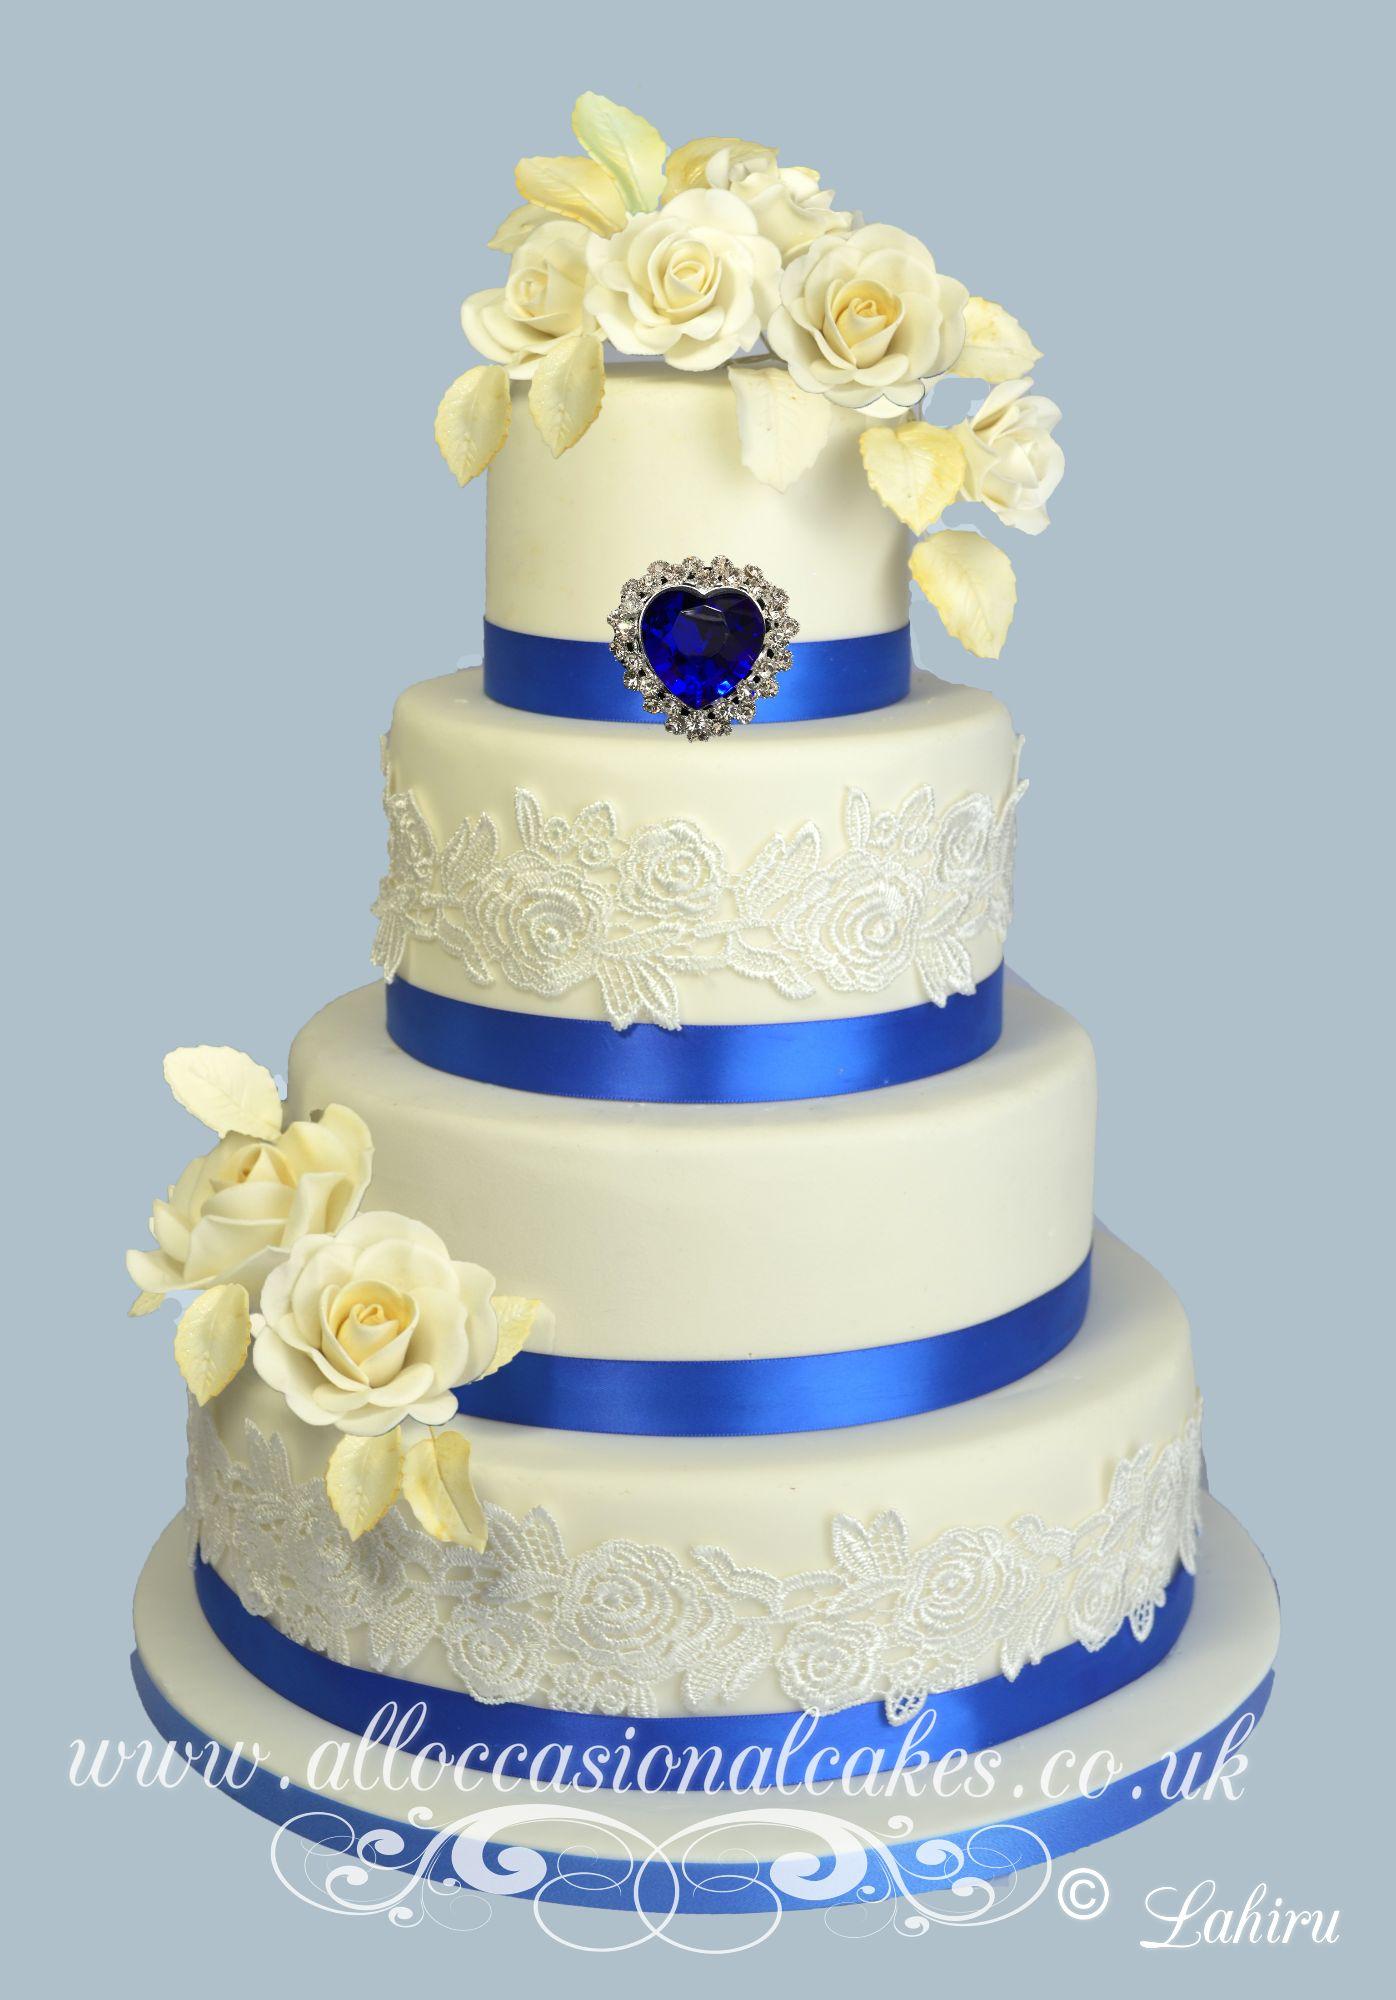 Royal blue brooch wedding cake